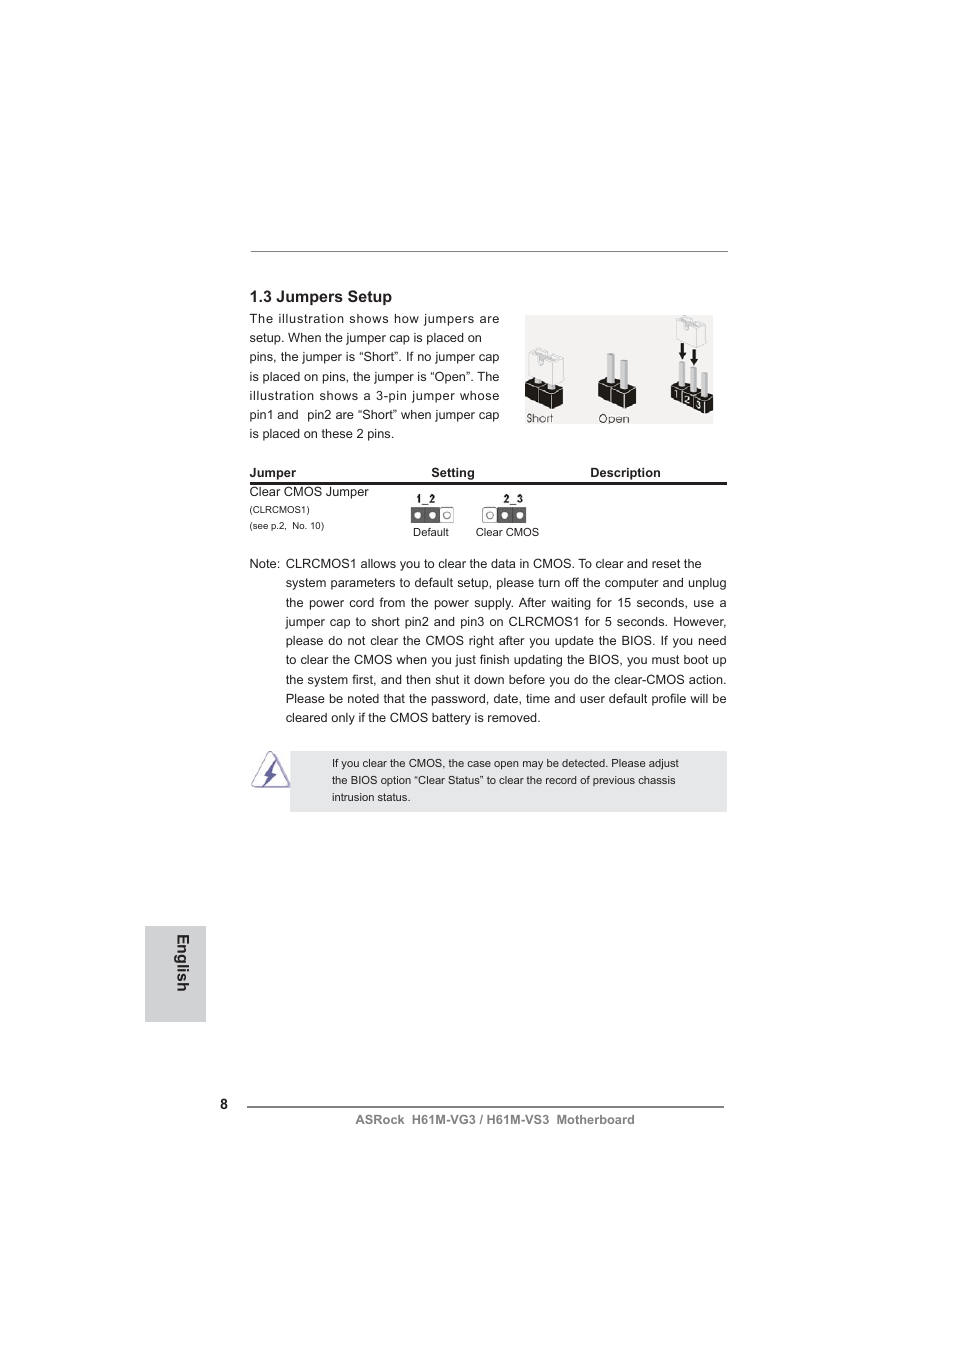 English 1 3 jumpers setup   ASRock H61M-VG3 User Manual   Page 8 / 48